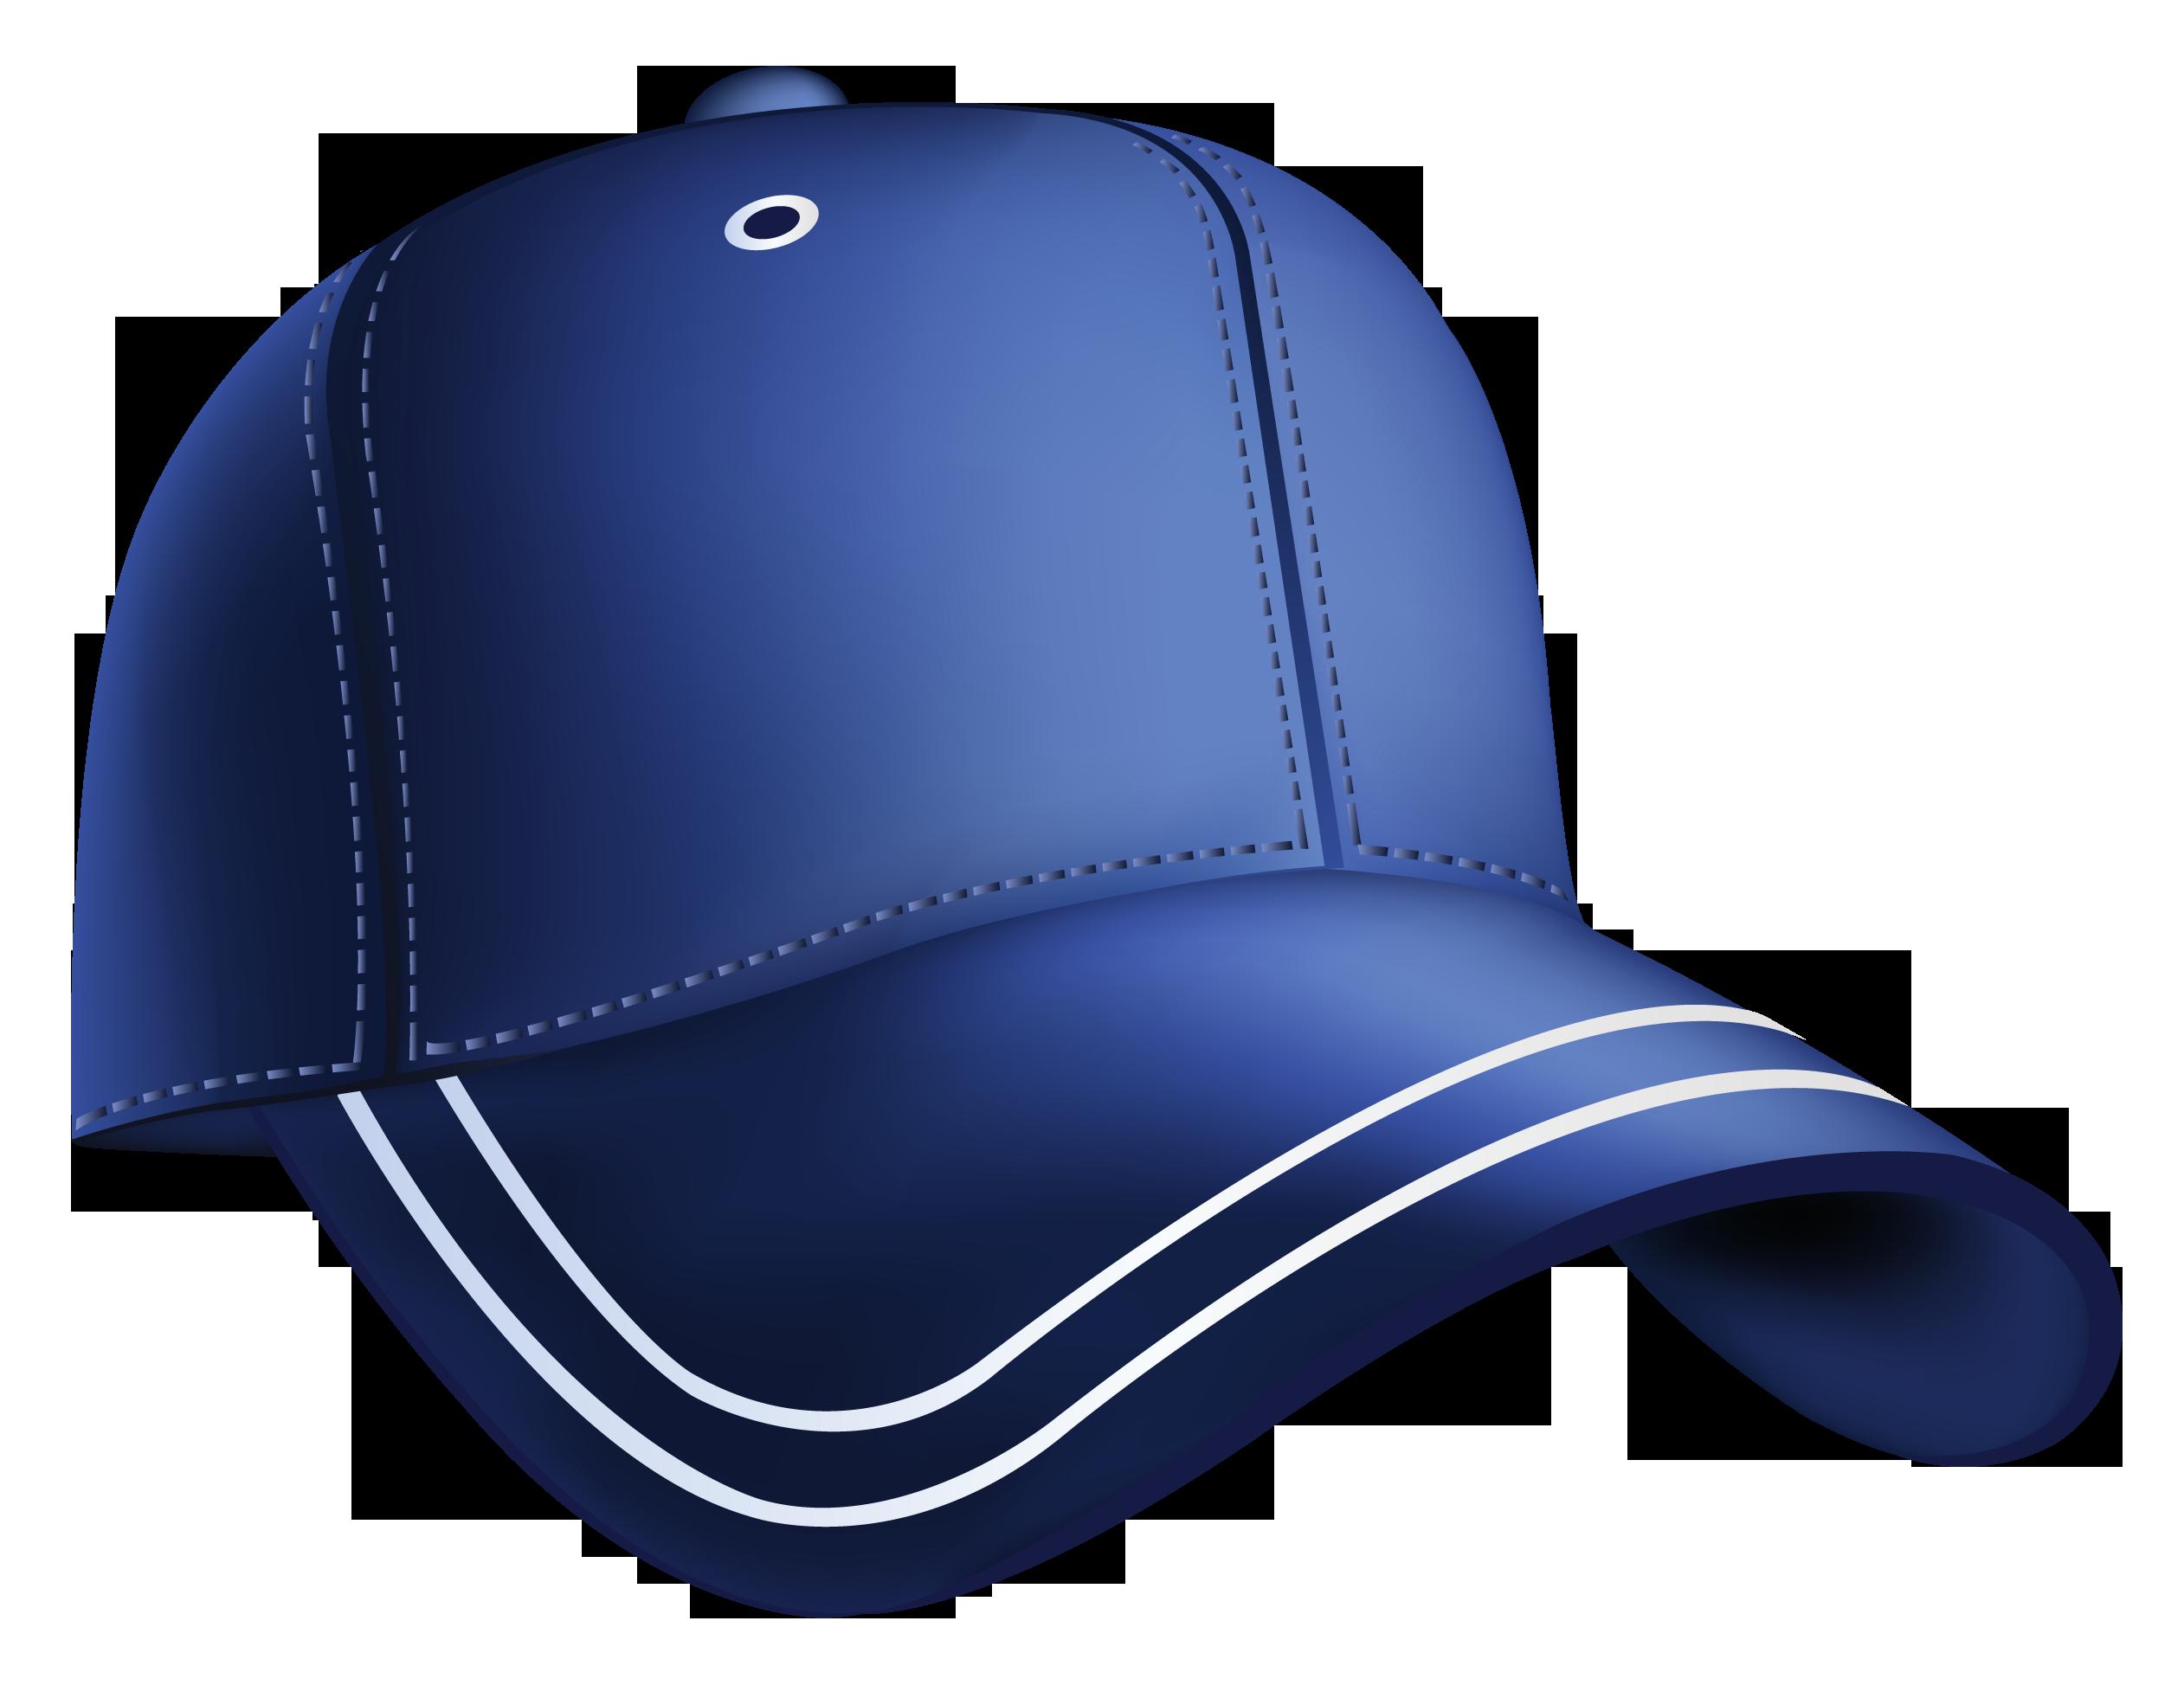 Hat Clipart - clipartall